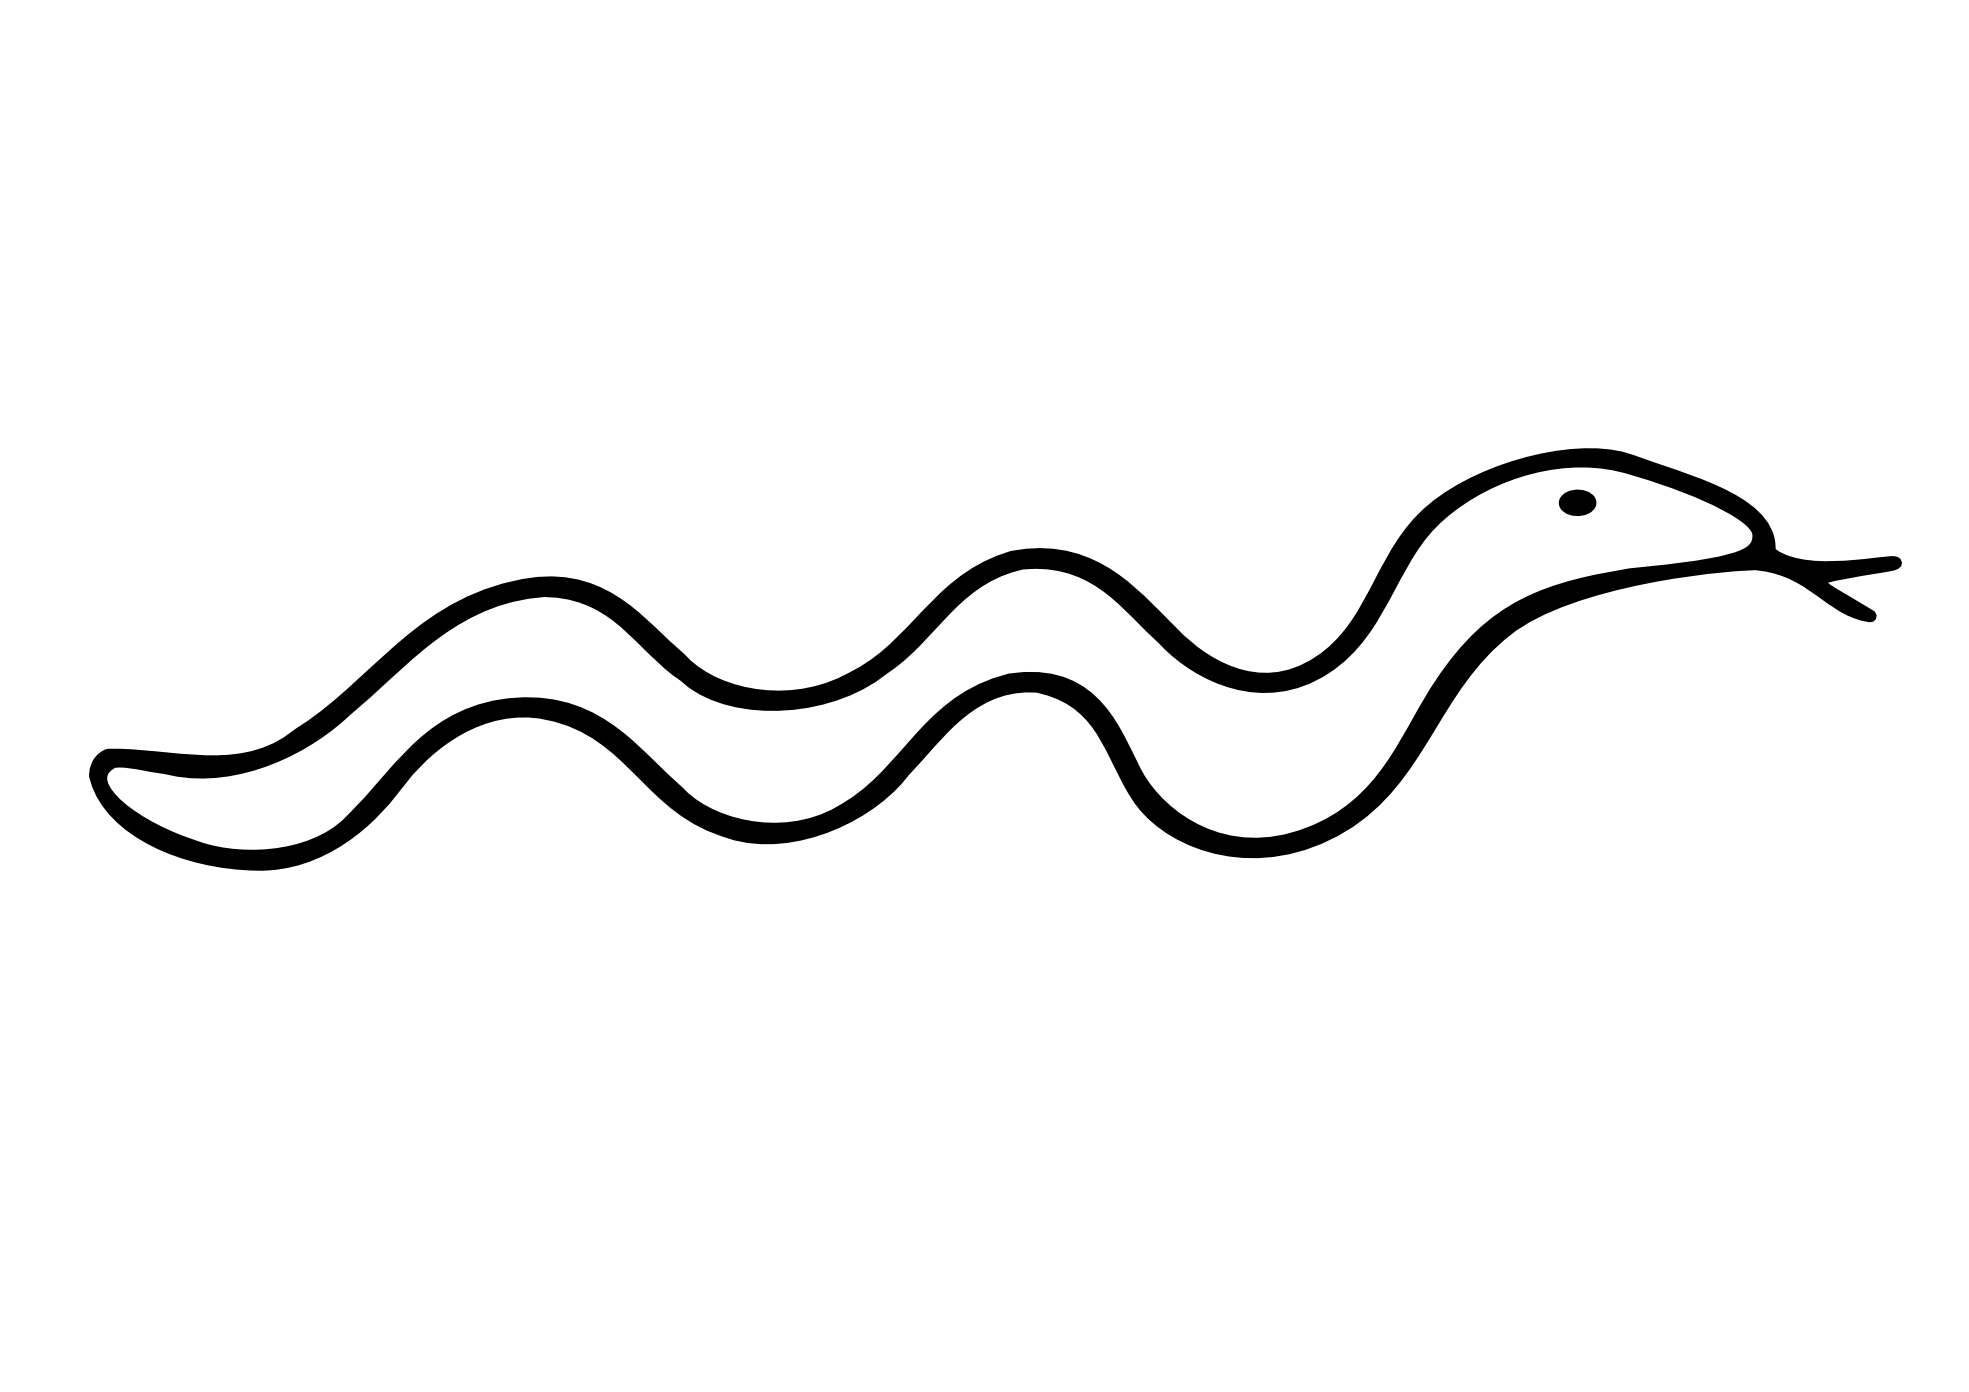 1969x1392 Snake Clipart Black And White